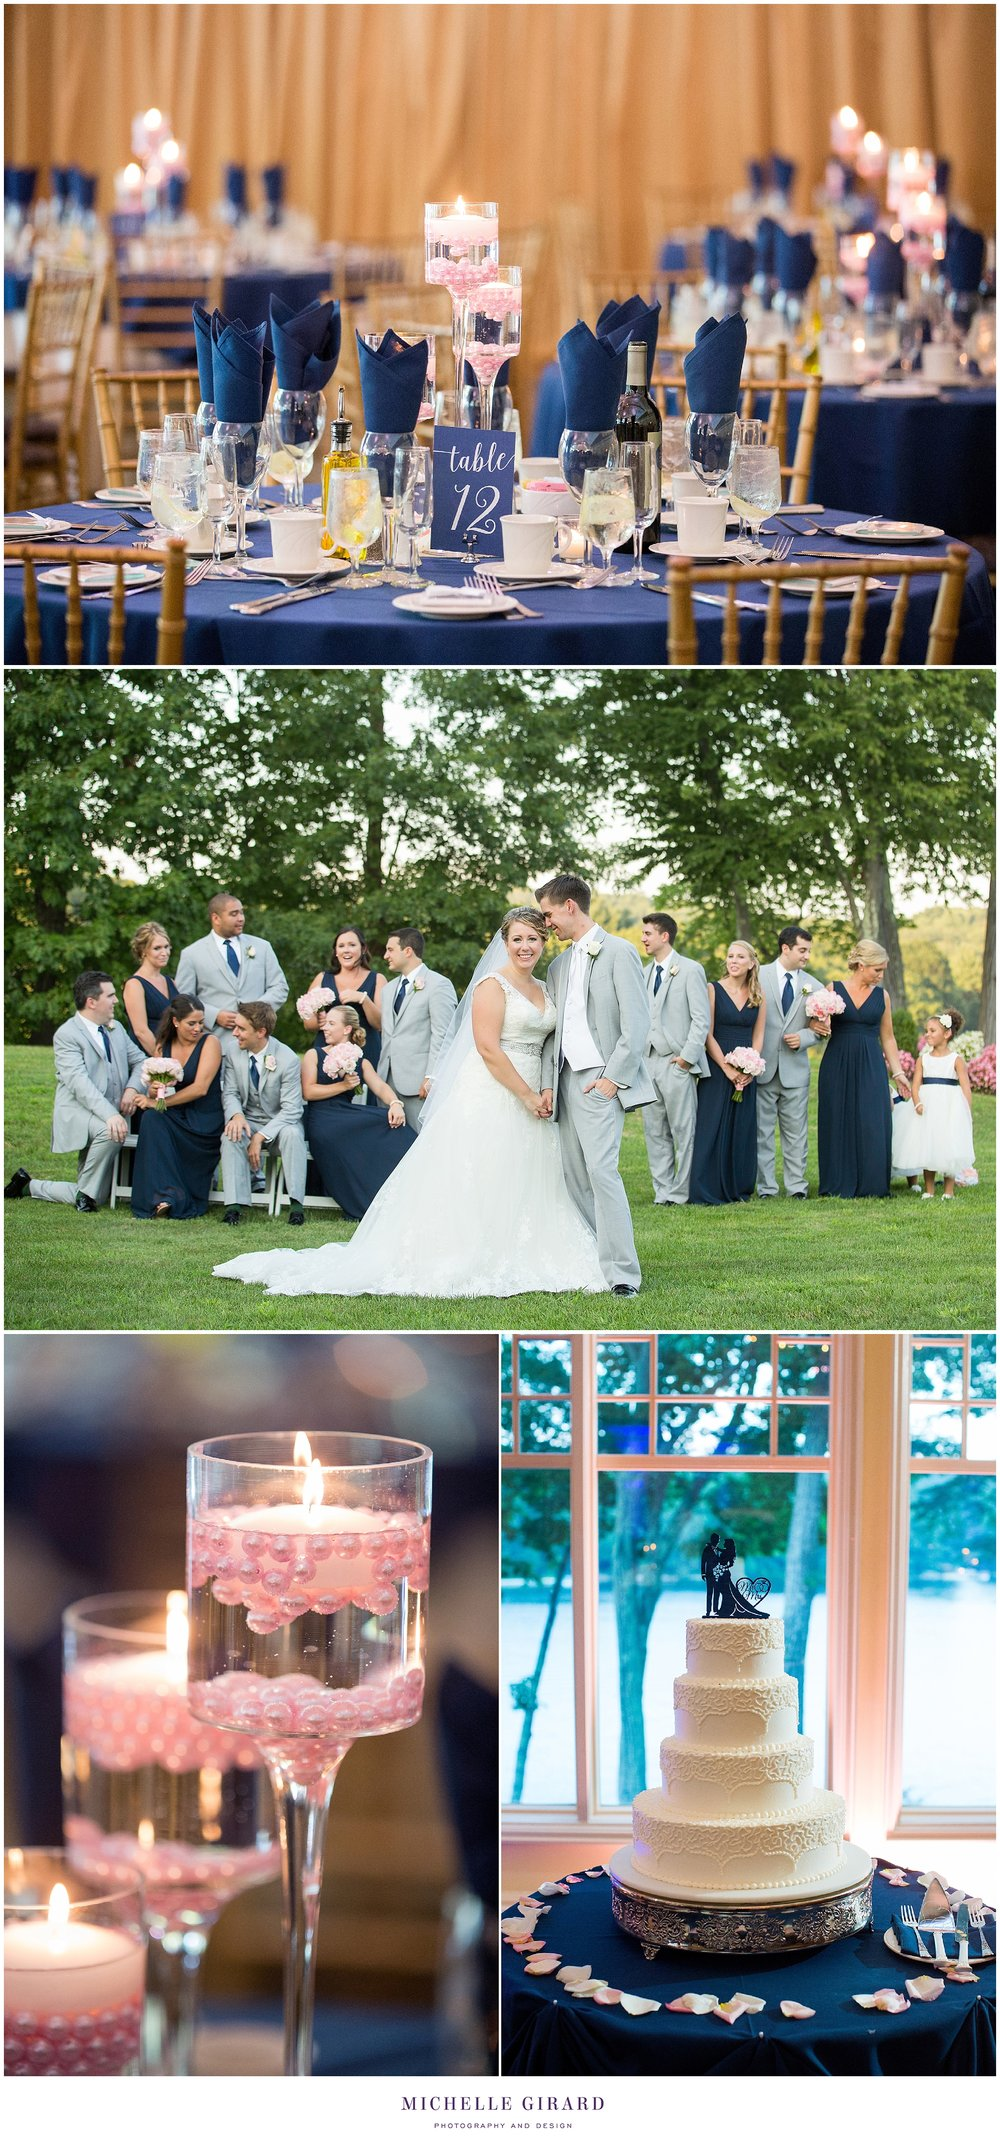 WaterviewWedding_ClassicBallroomWedding_SummerGardens_MonroeCT_MichelleGirardPhotography09.jpg